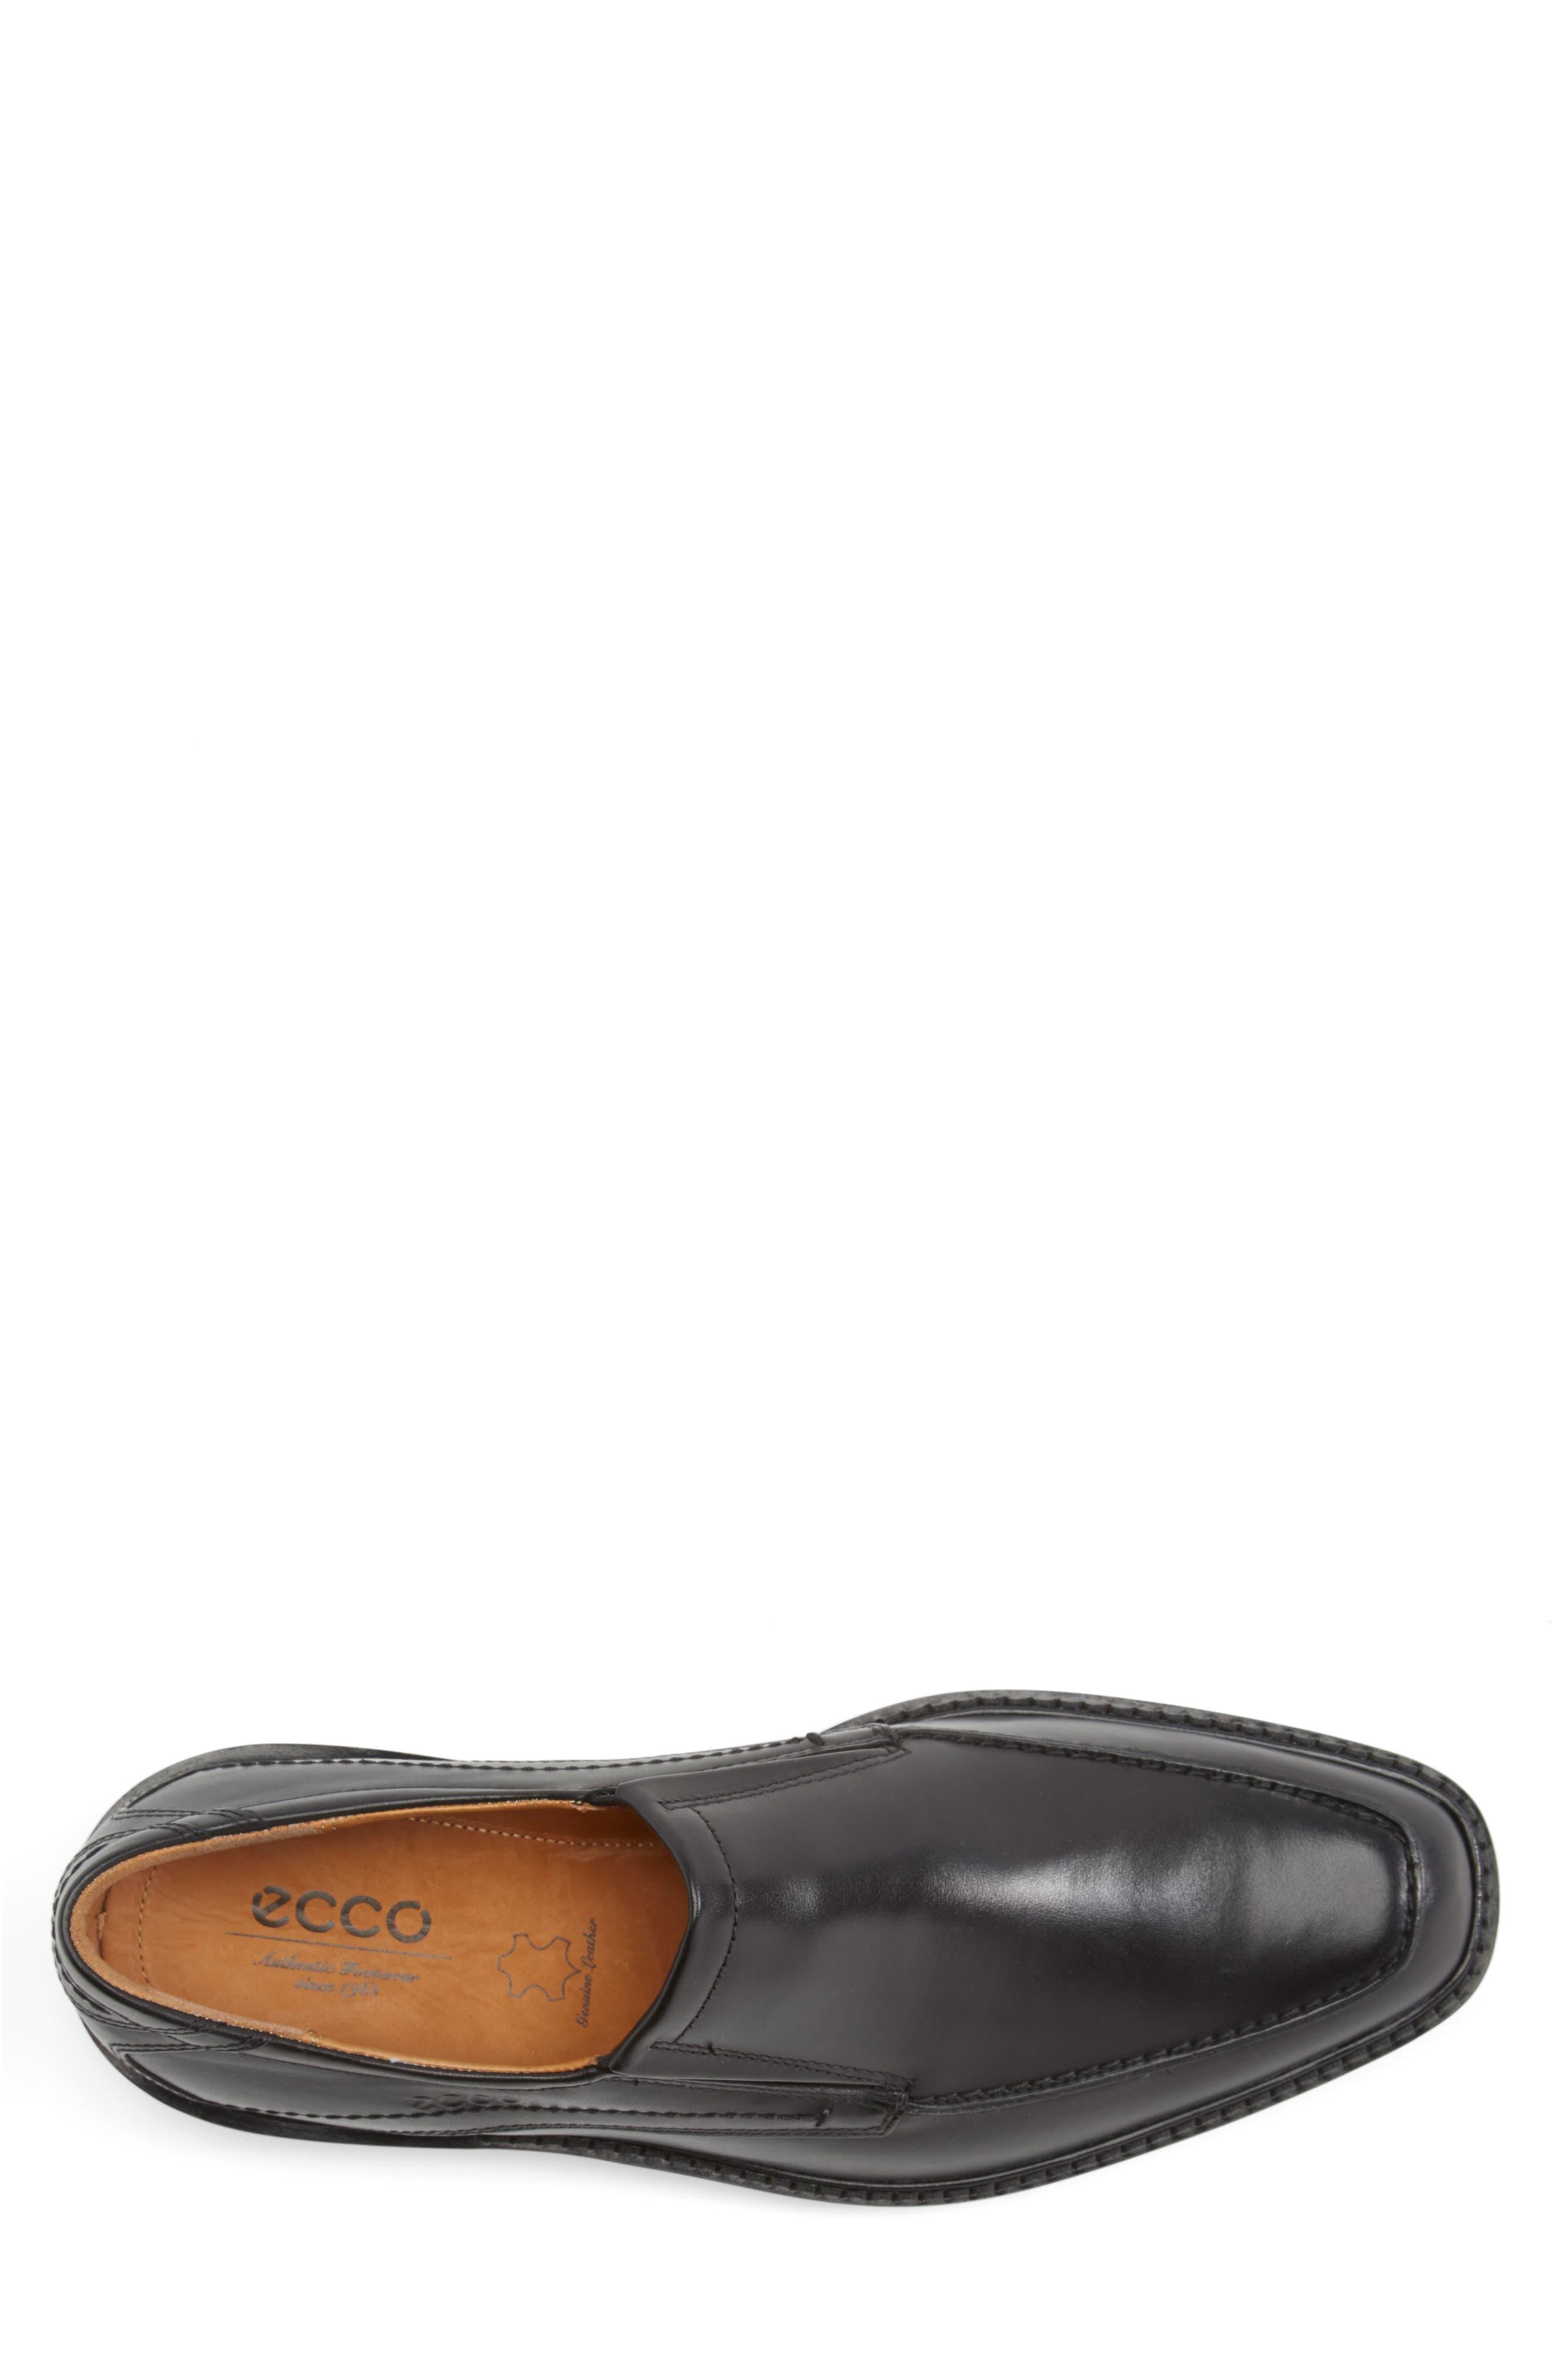 'Windsor' Slip-On,                             Alternate thumbnail 3, color,                             Black/Black Leather